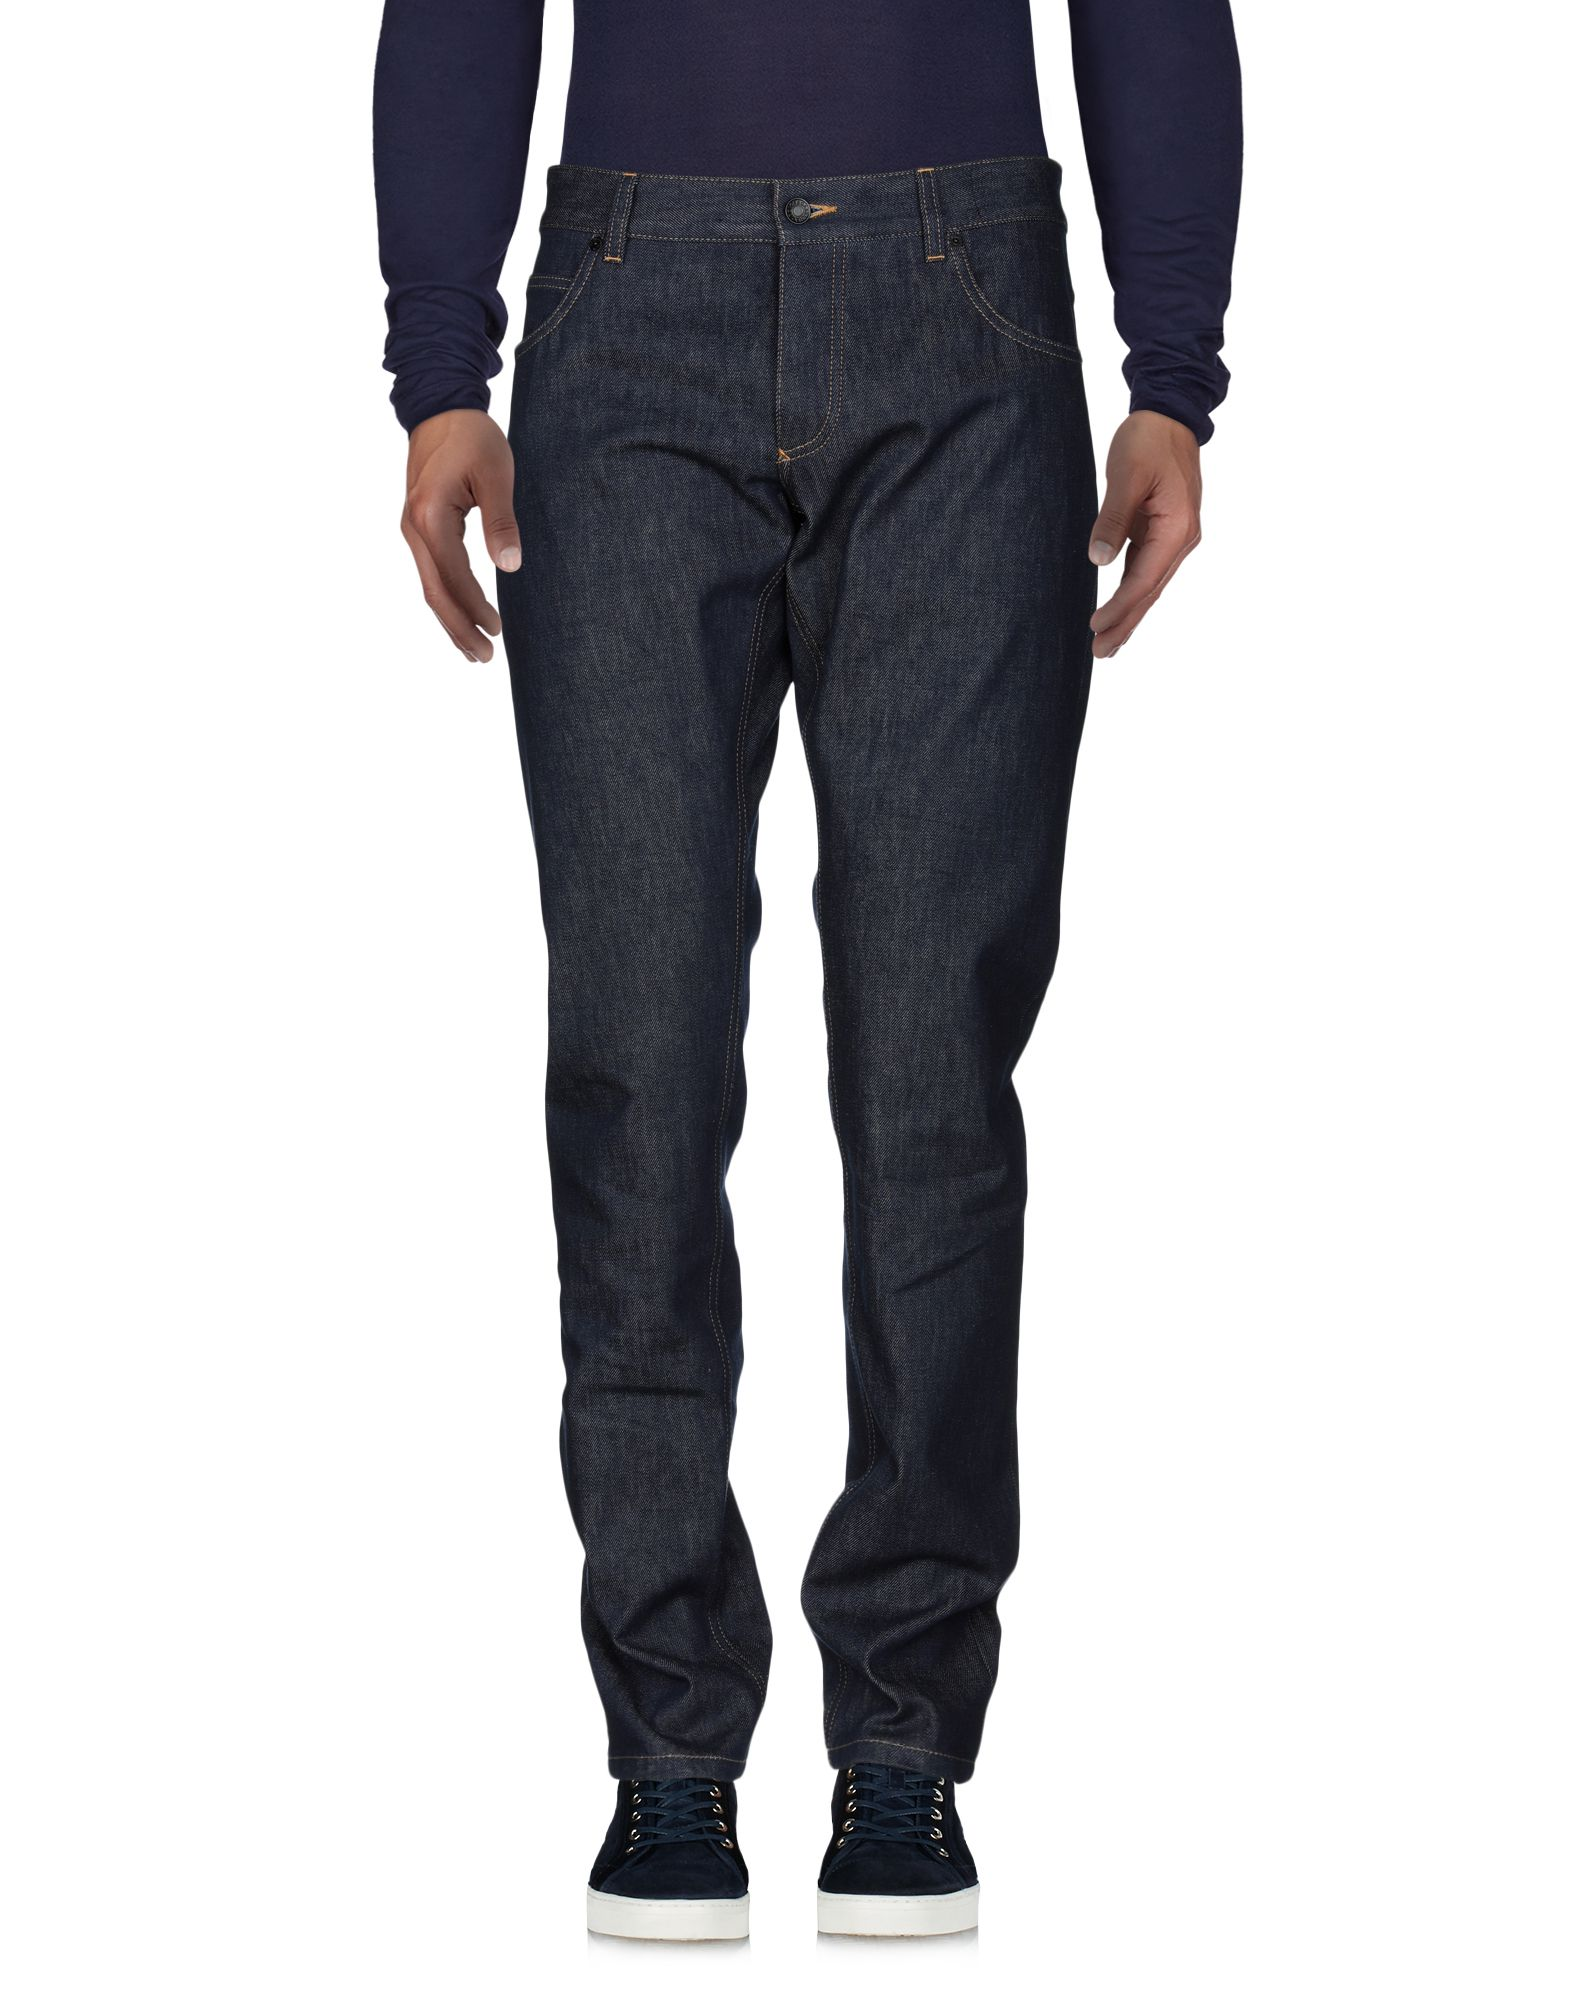 Pantaloni Jeans Dolce & Gabbana Uomo 42684680XT - 42684680XT Uomo cbf896